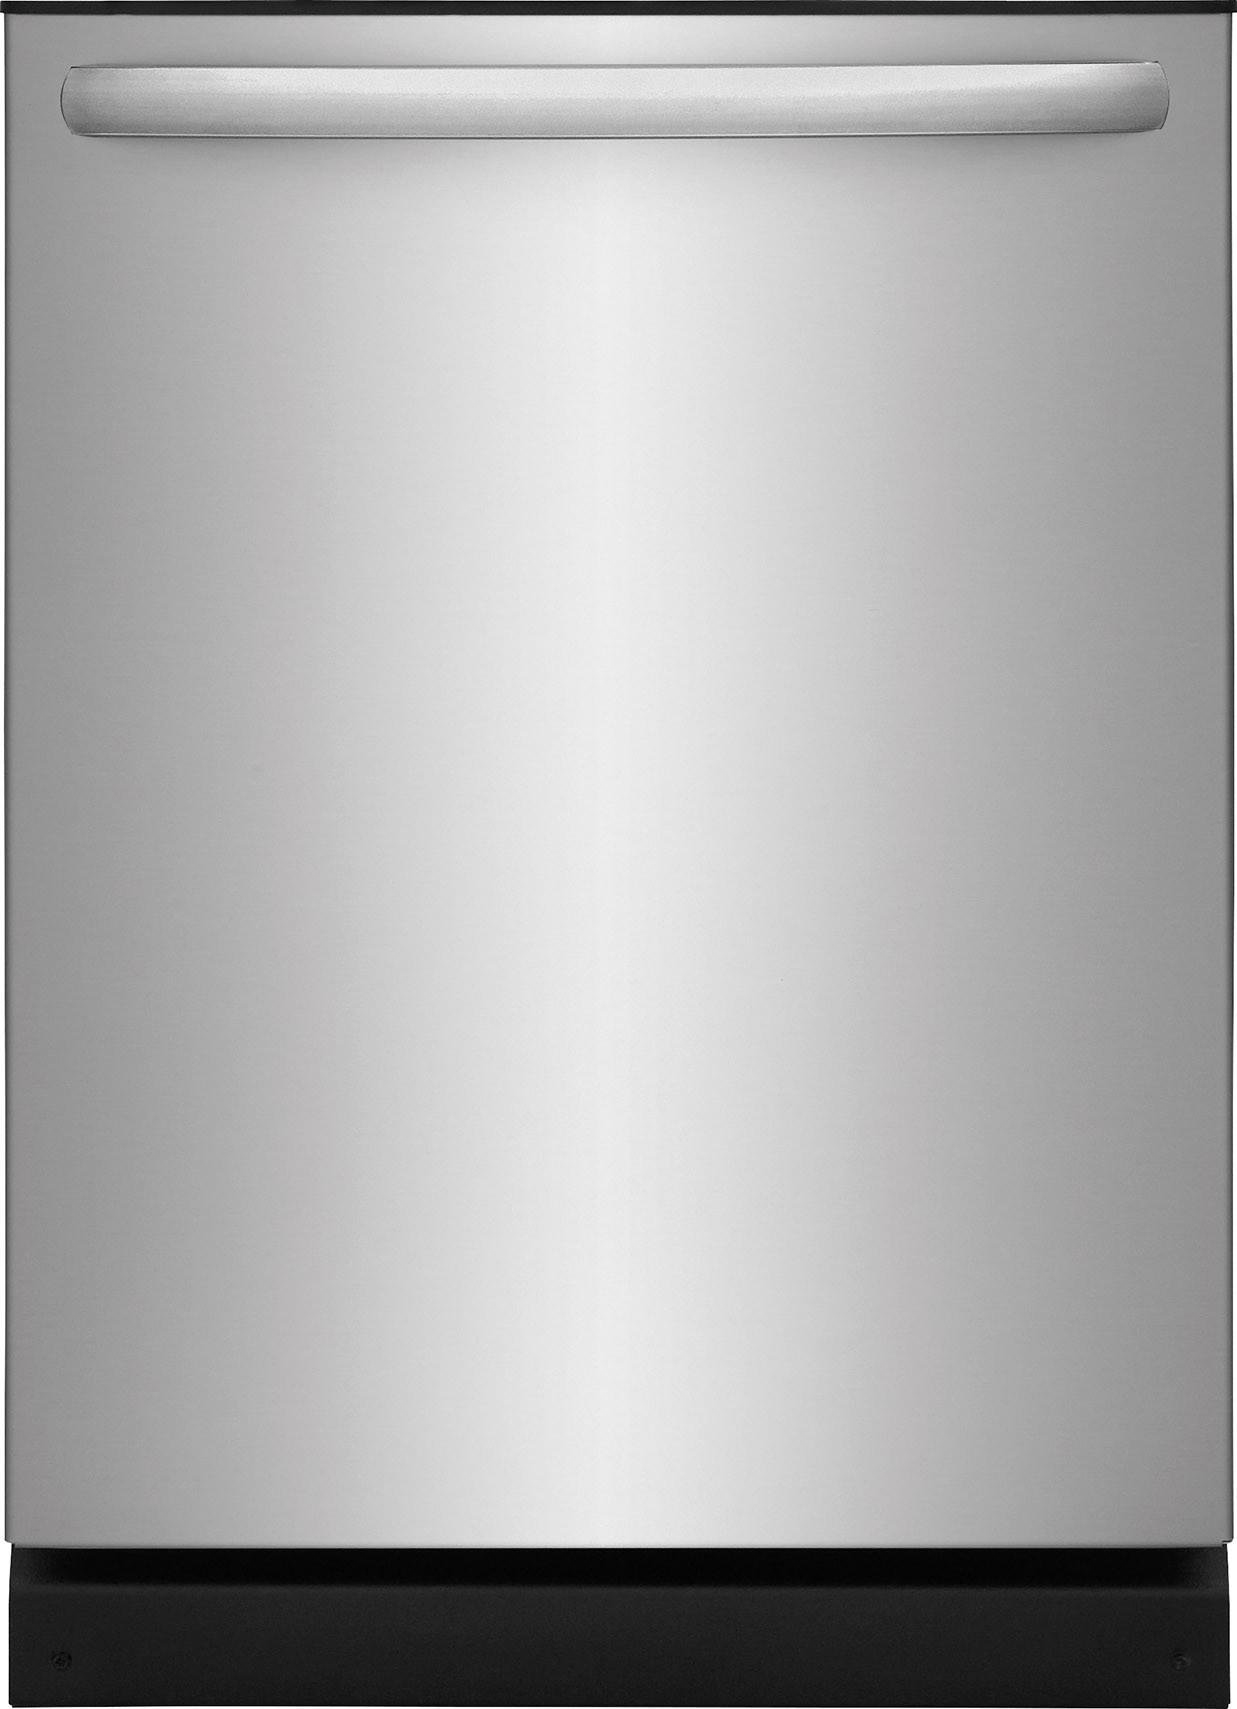 Frigidaire 24 Tall Tub Dishwasher Stainless Steel Ffid2426ts